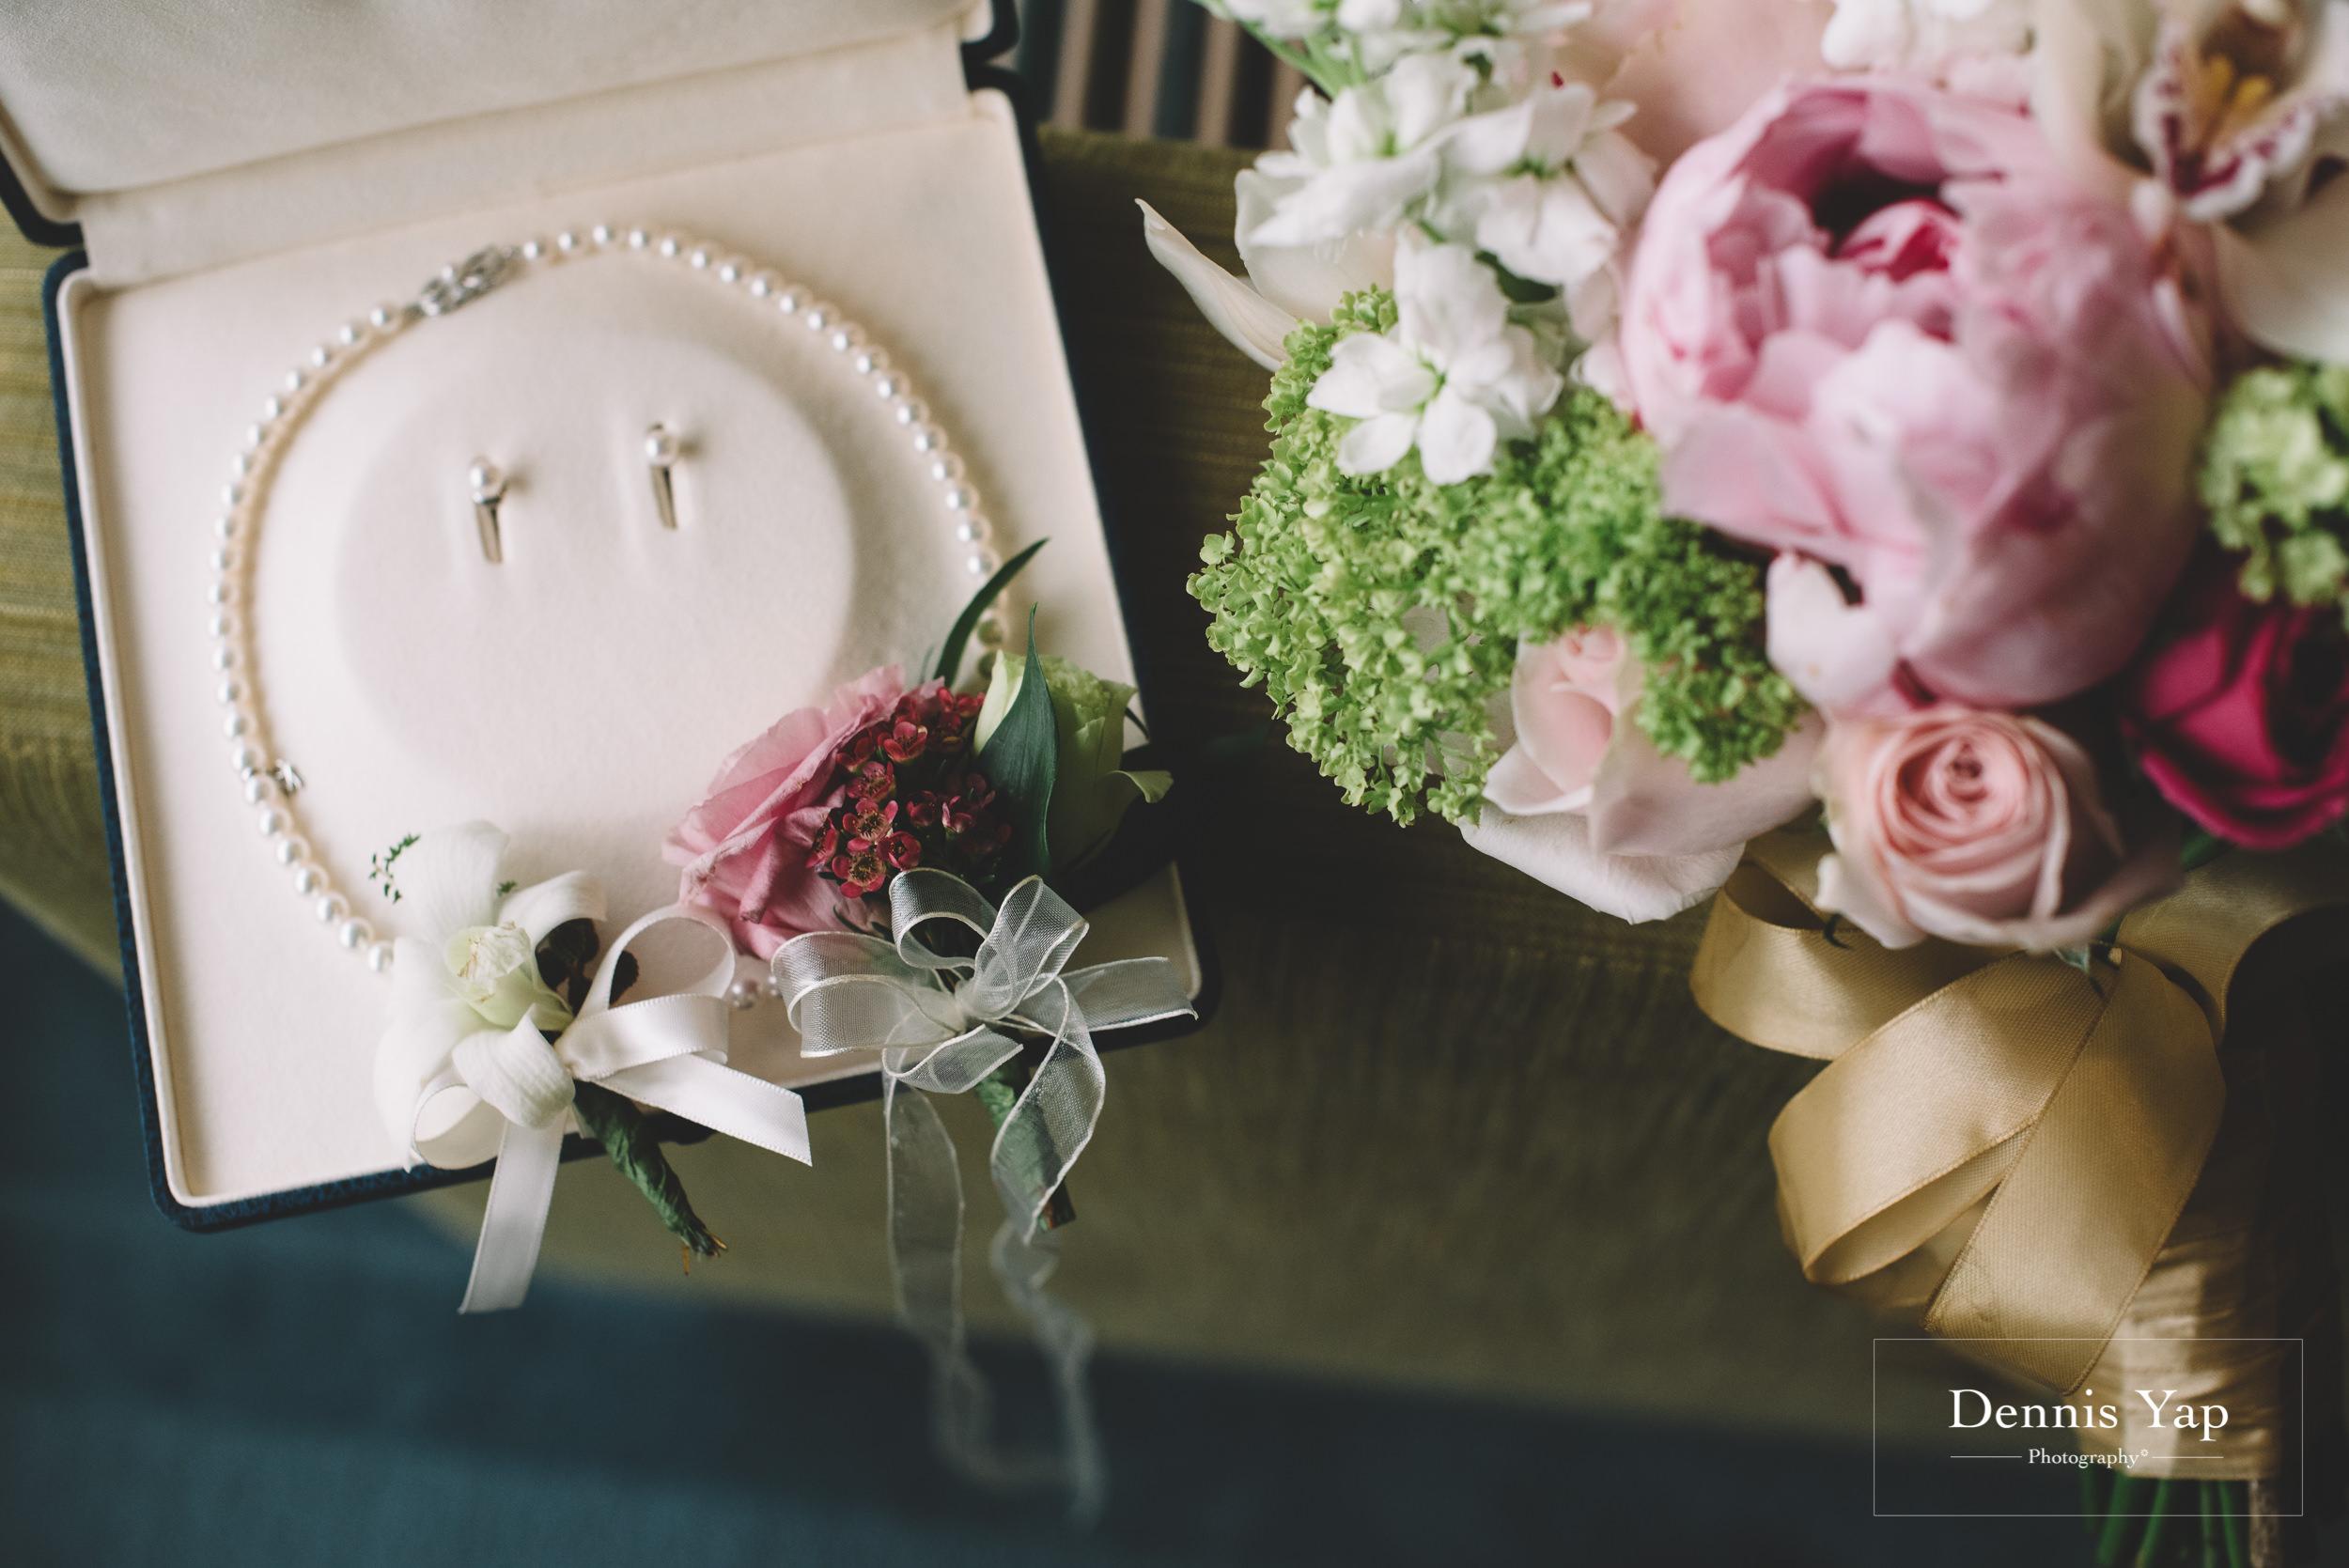 jinhan jacqui church wedding xavier catholic dennis yap photography malaysia wedding photographer-3.jpg